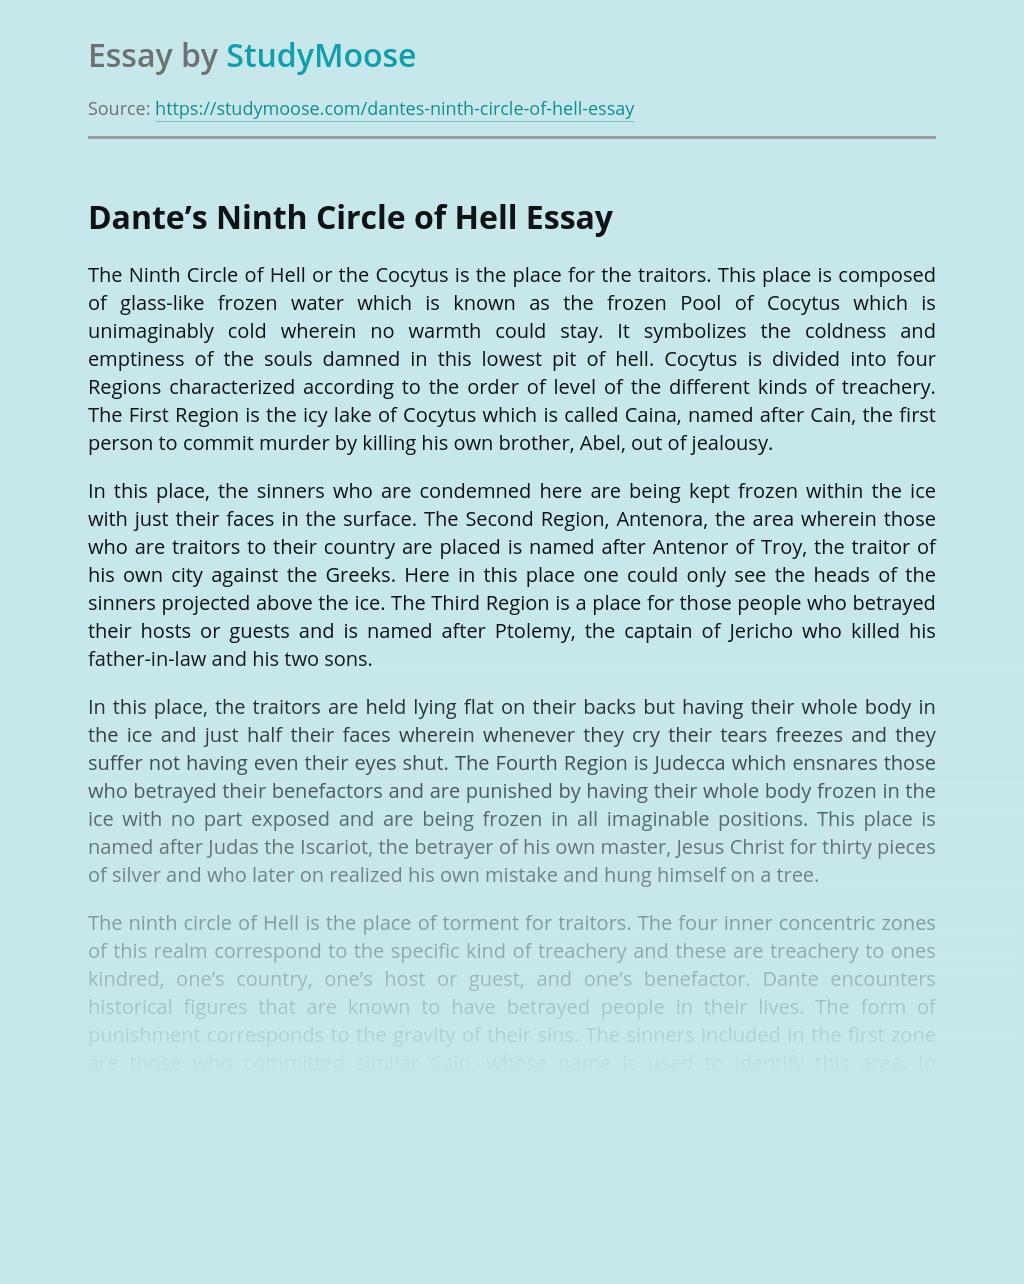 Dante's Ninth Circle of Hell